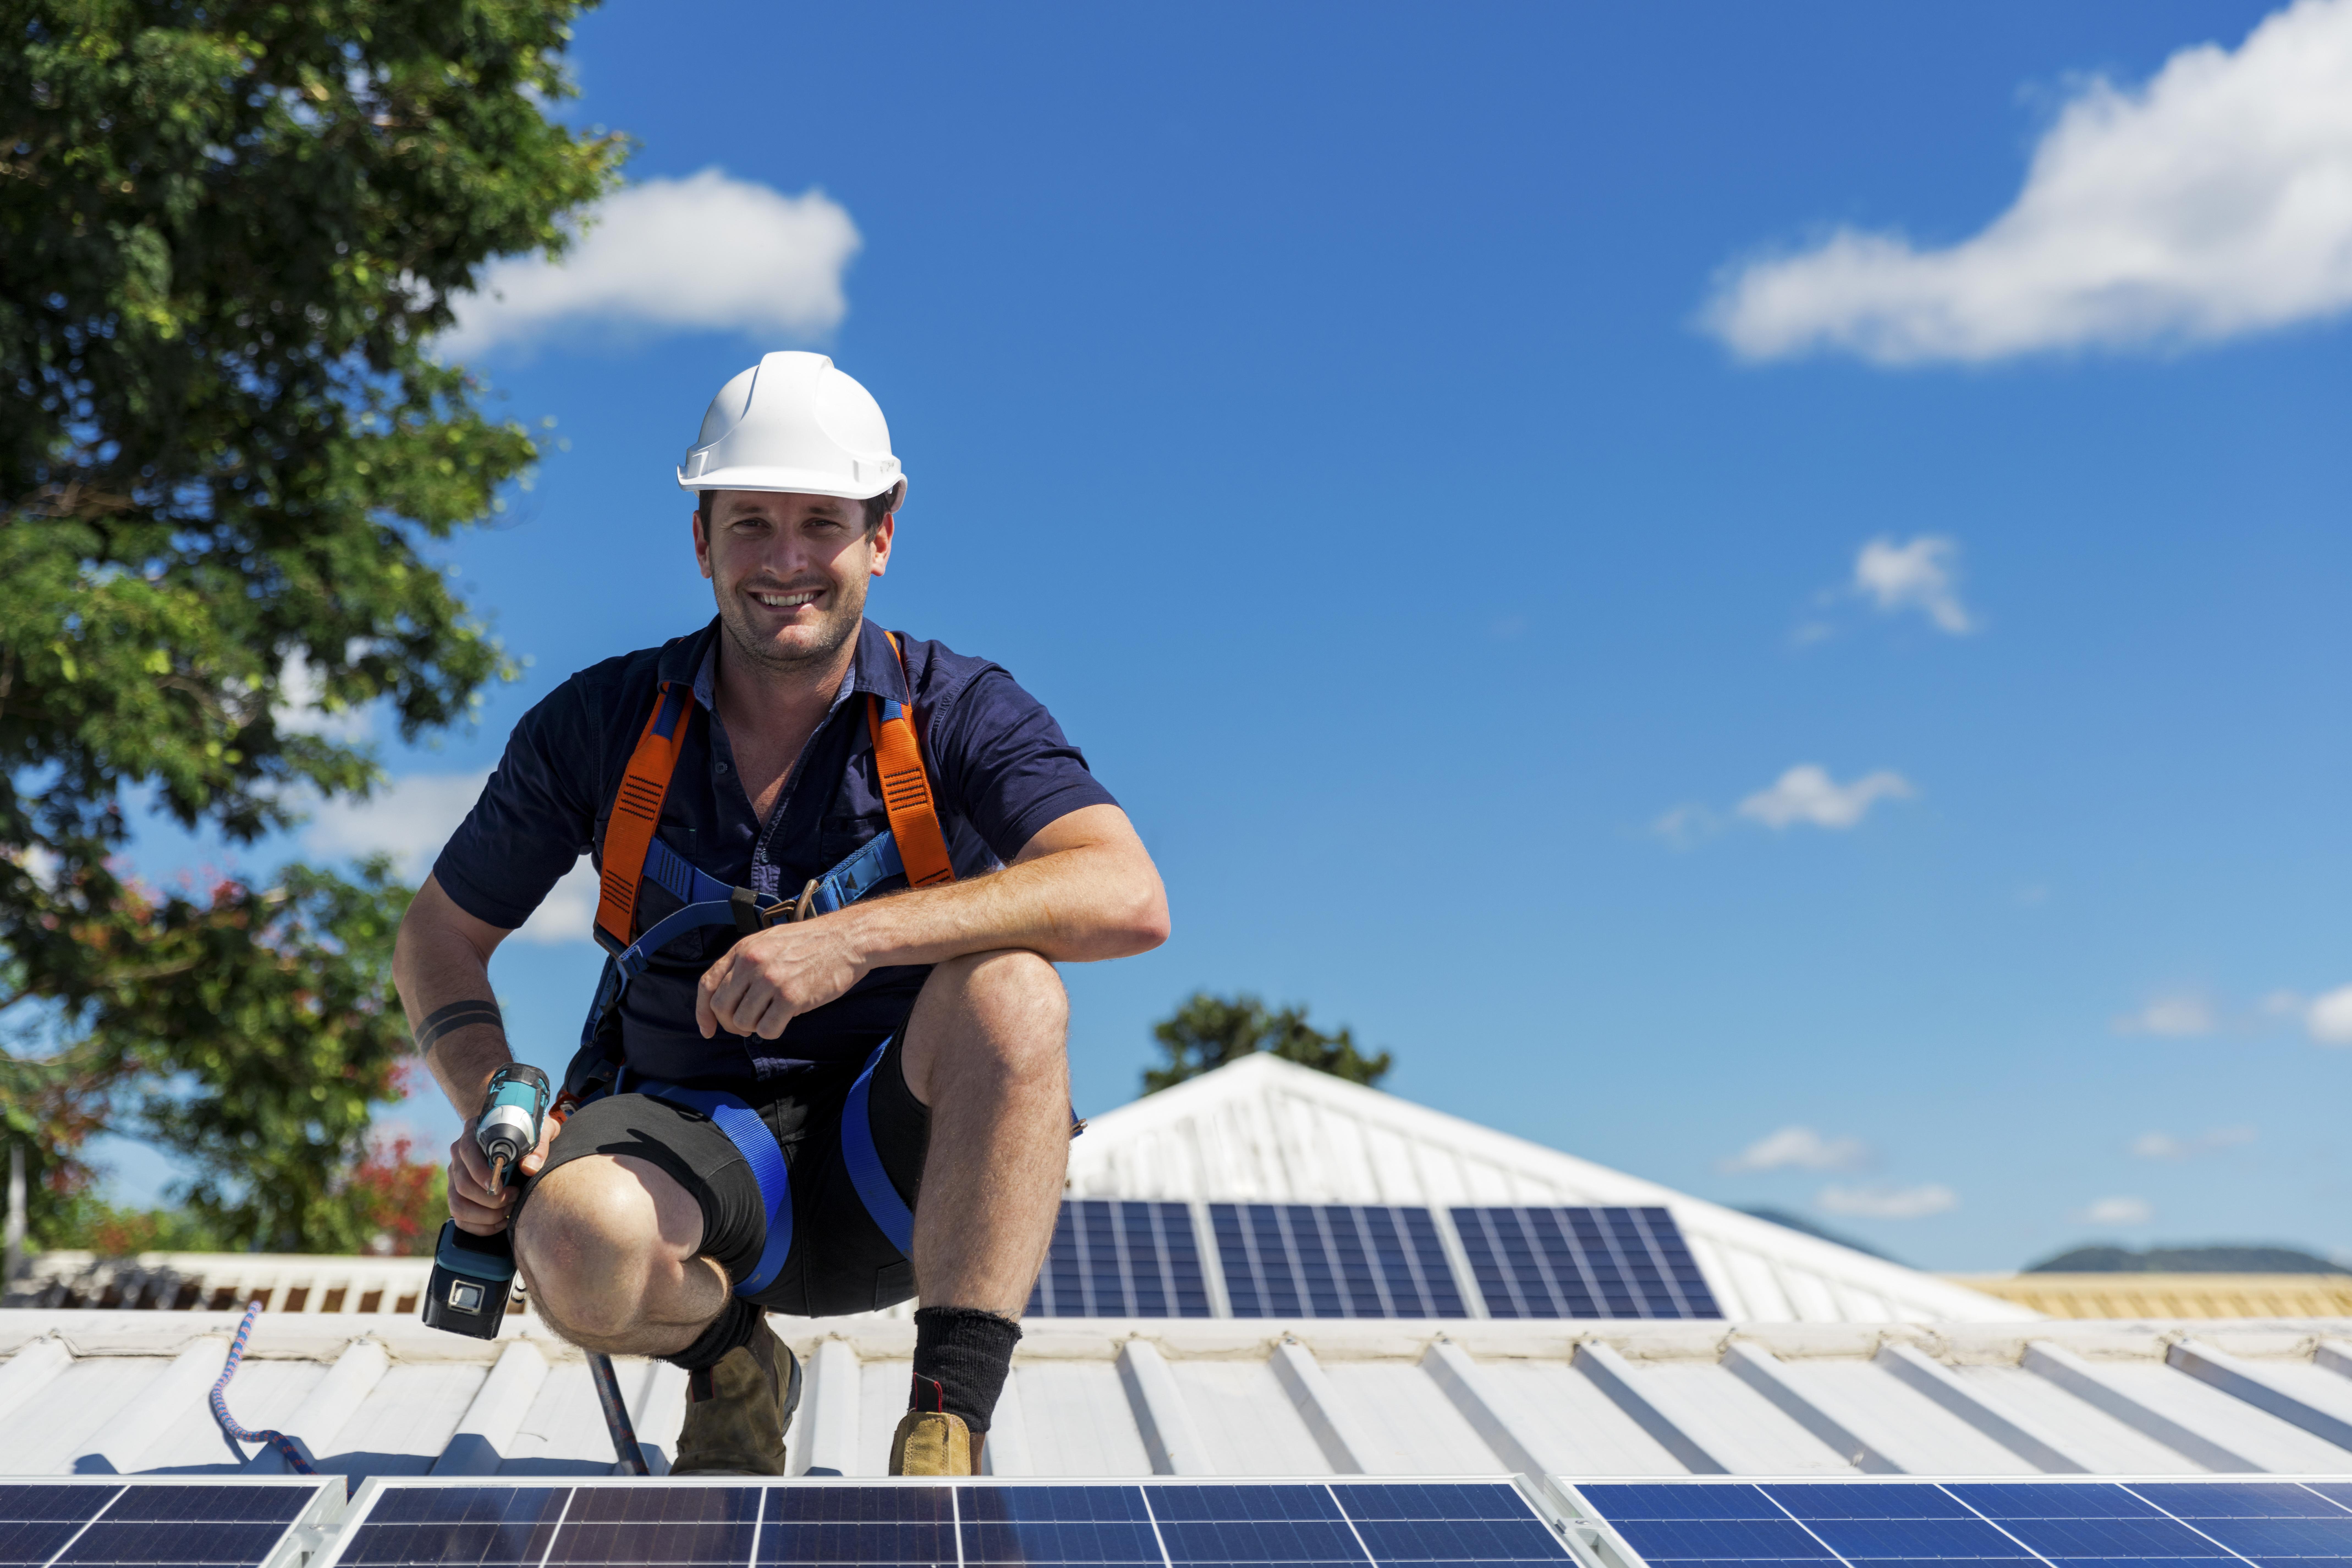 solar power installation training course